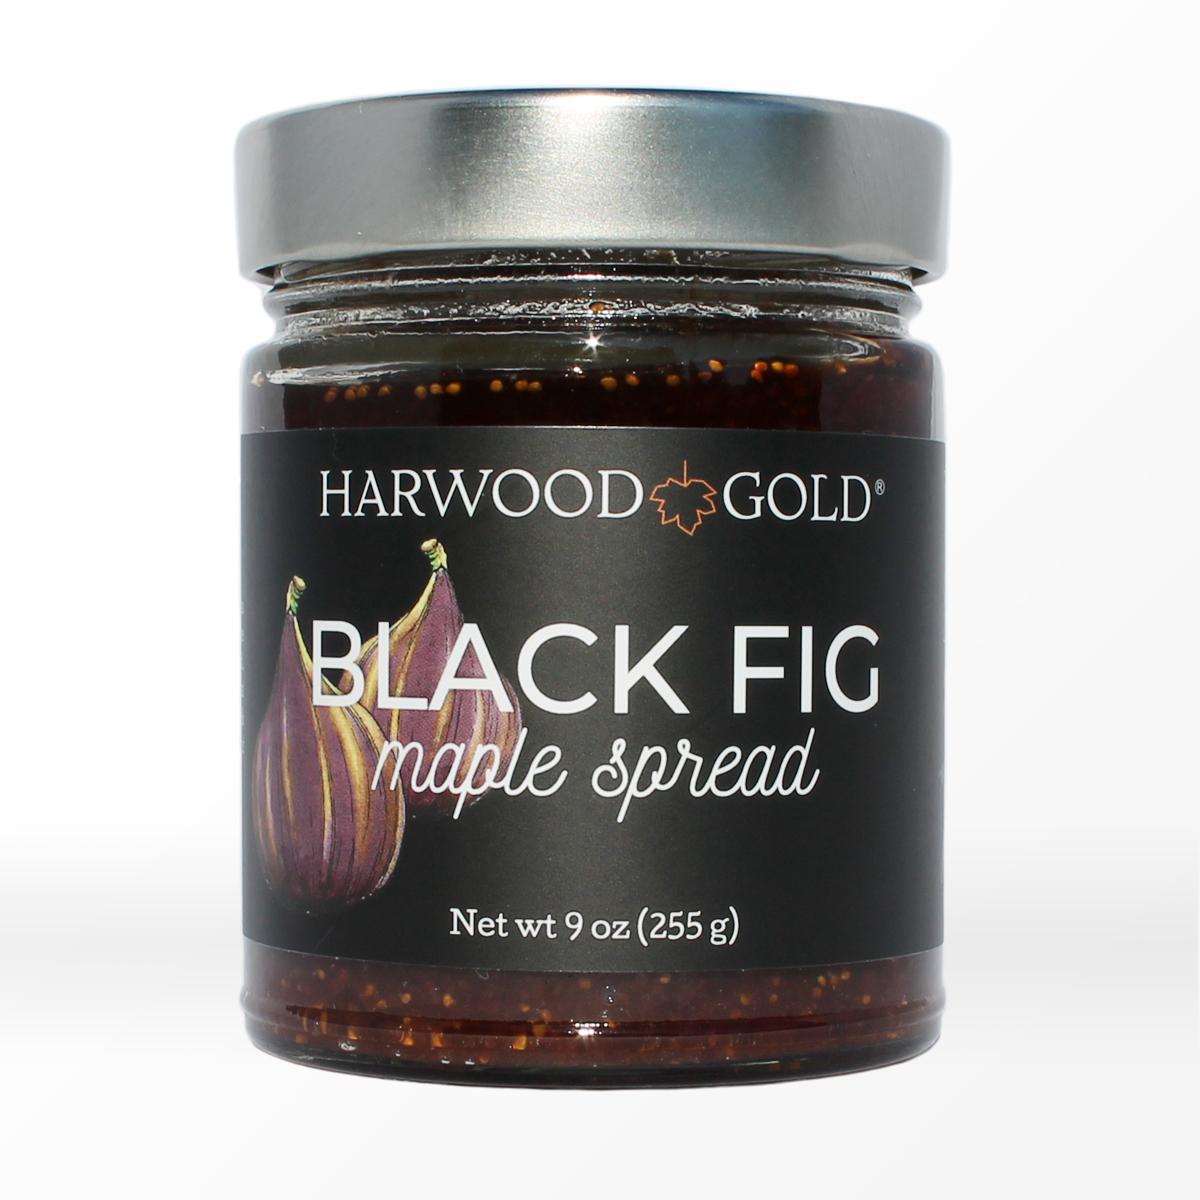 Harwood Gold Black Fig Maple Spread